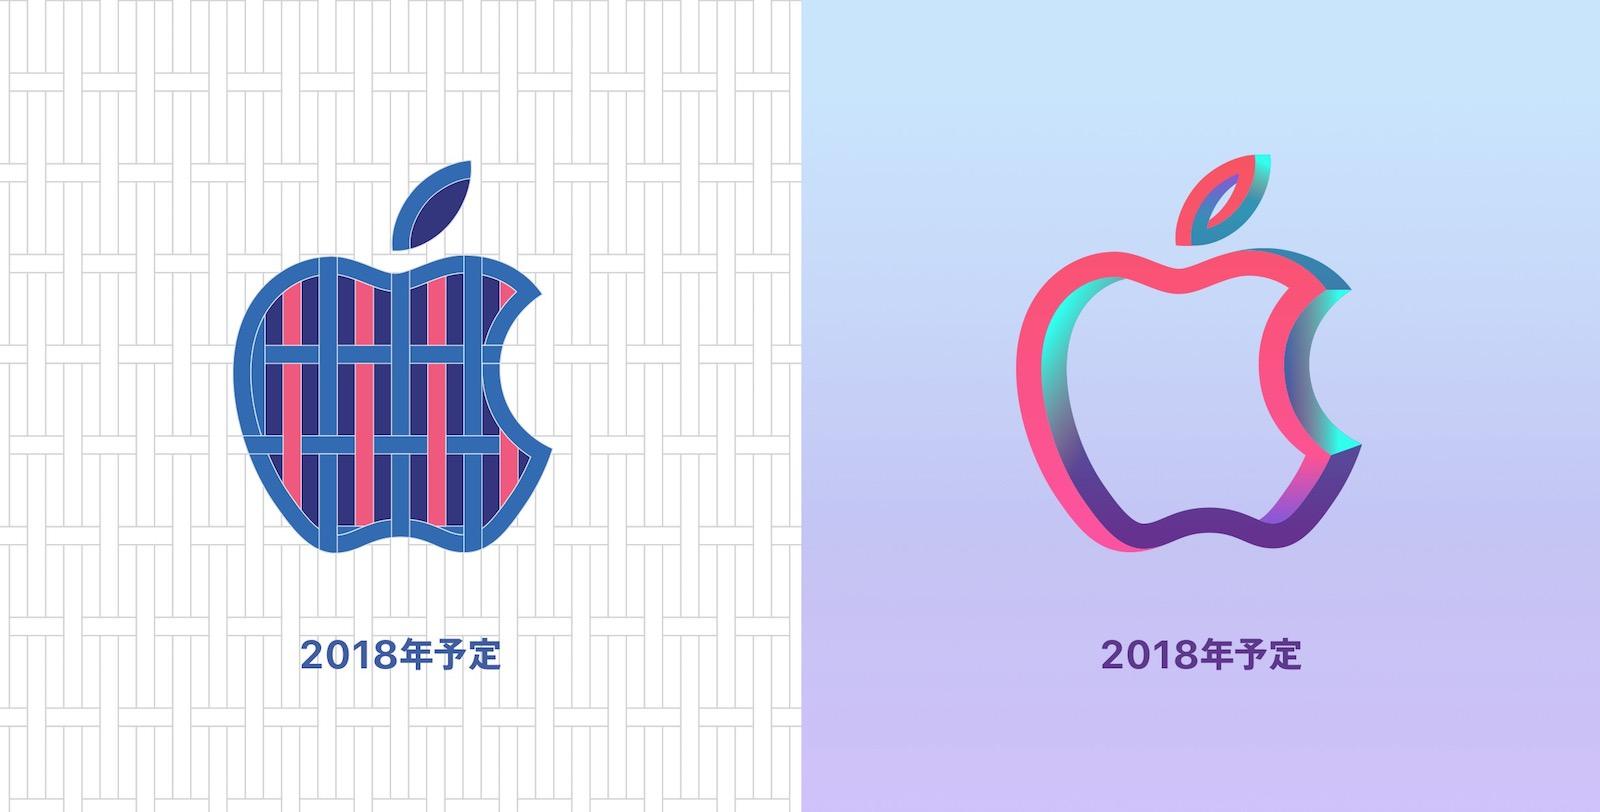 New-Apple-Stores-in-Japan-2.jpg